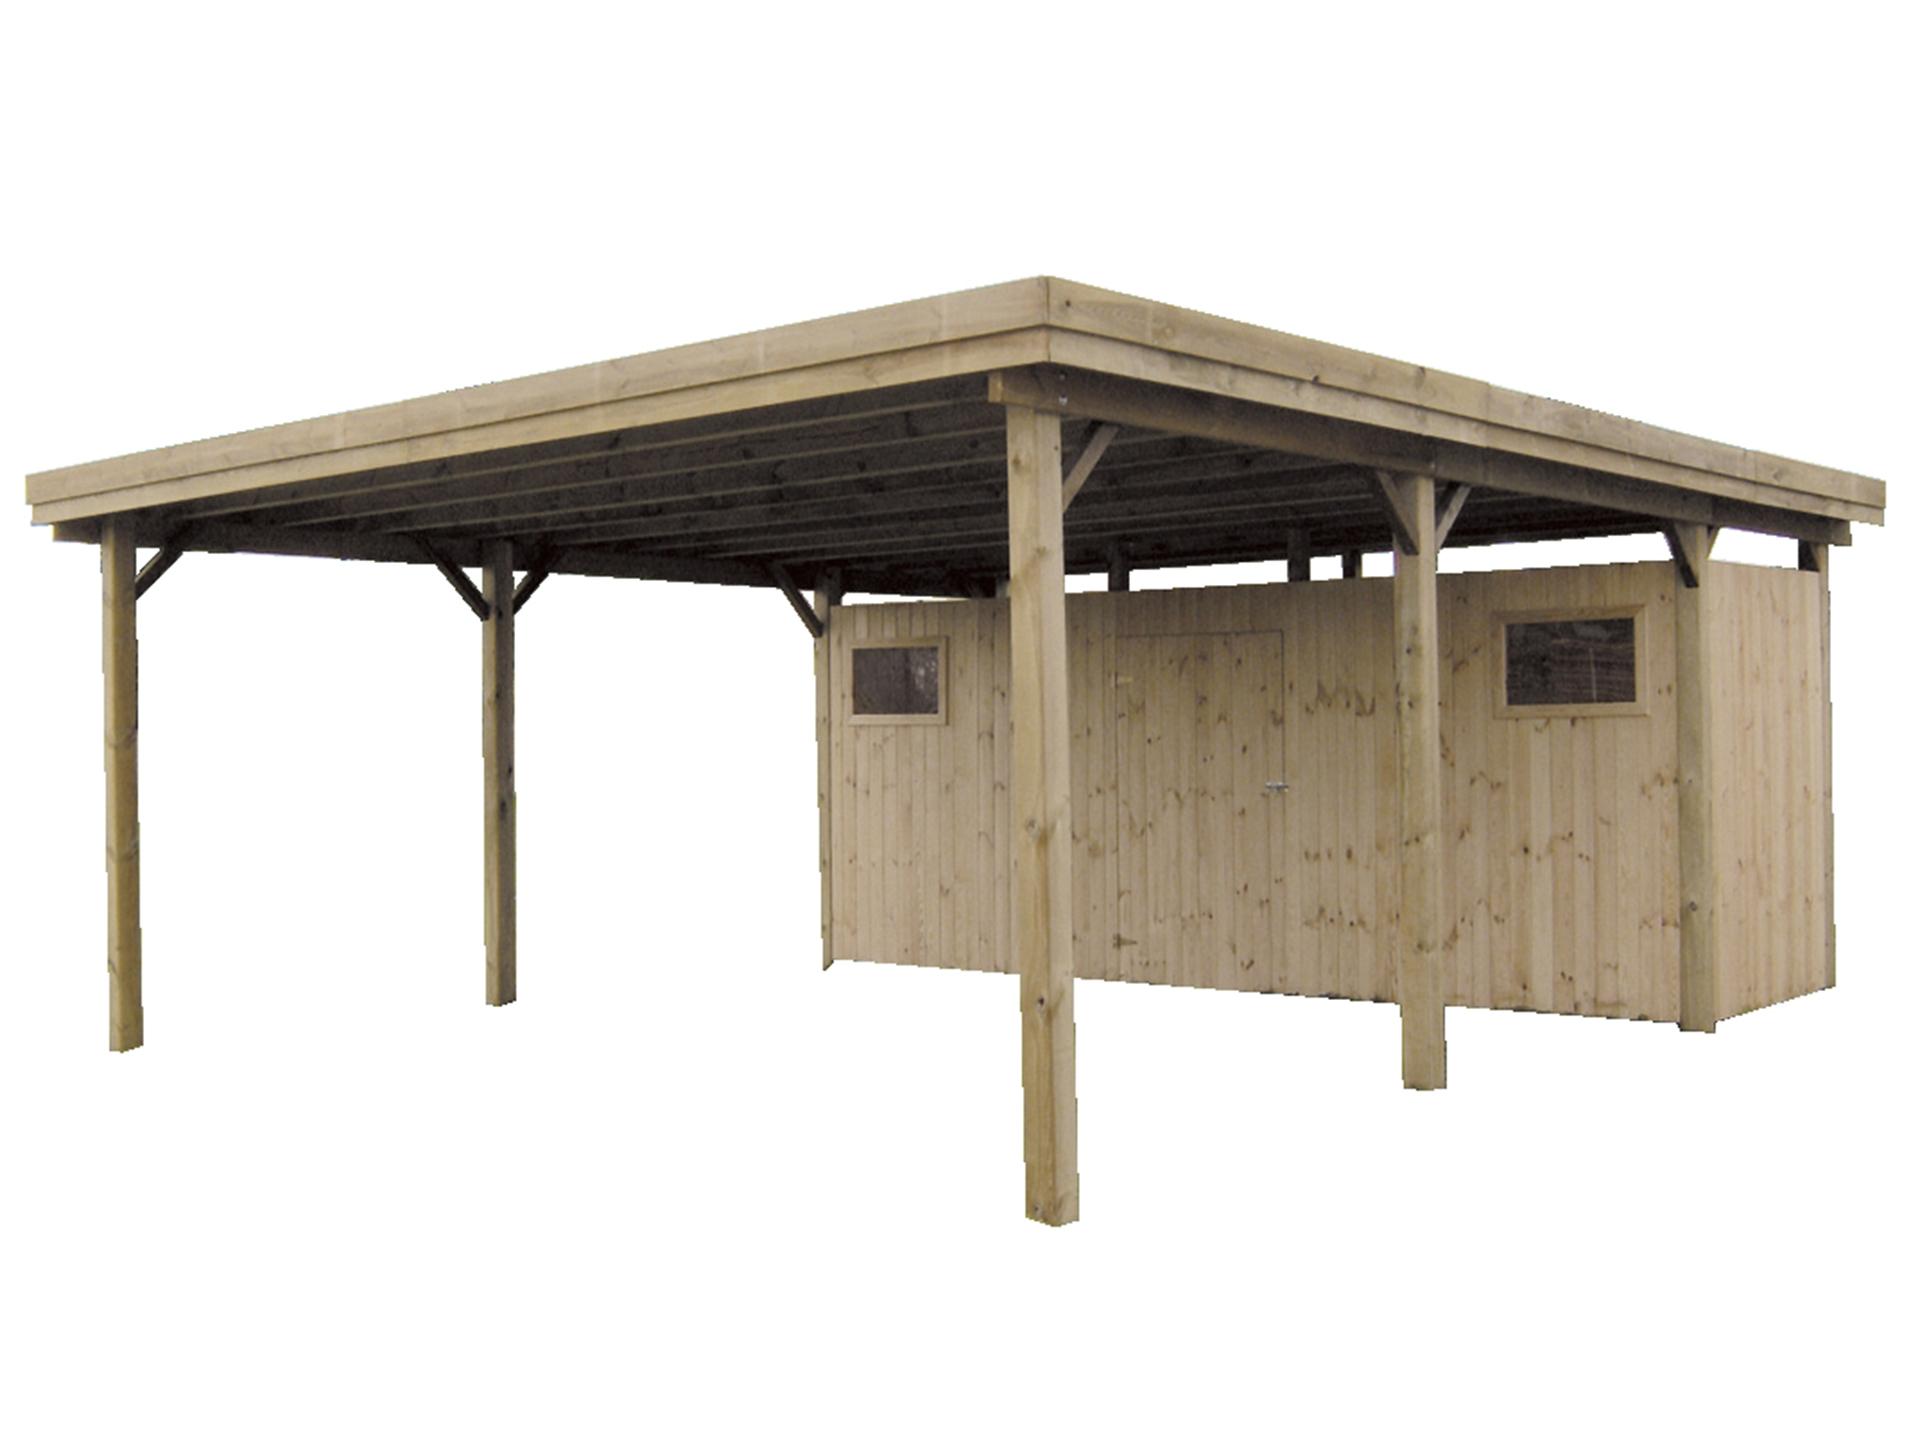 gardenas gent carport 600x670 cm hout hubo